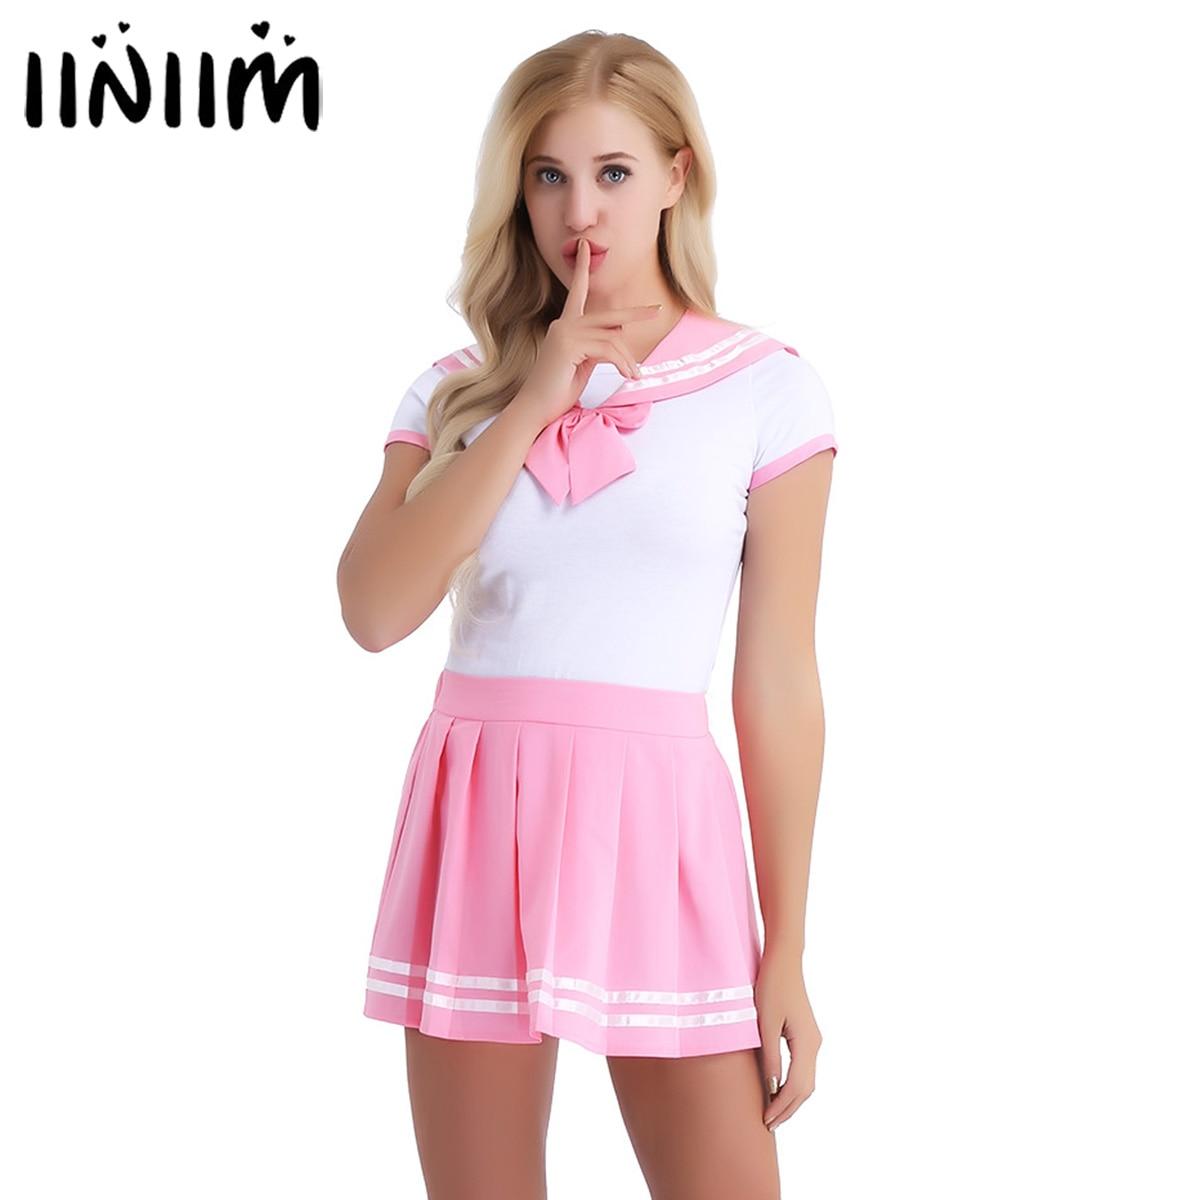 Iiniim feminino adulto roupas de bebê aberto virilha escola meninas sexy macacão com mini saia plissada cosplay trajes festa clubwearFantasias Sexy   -